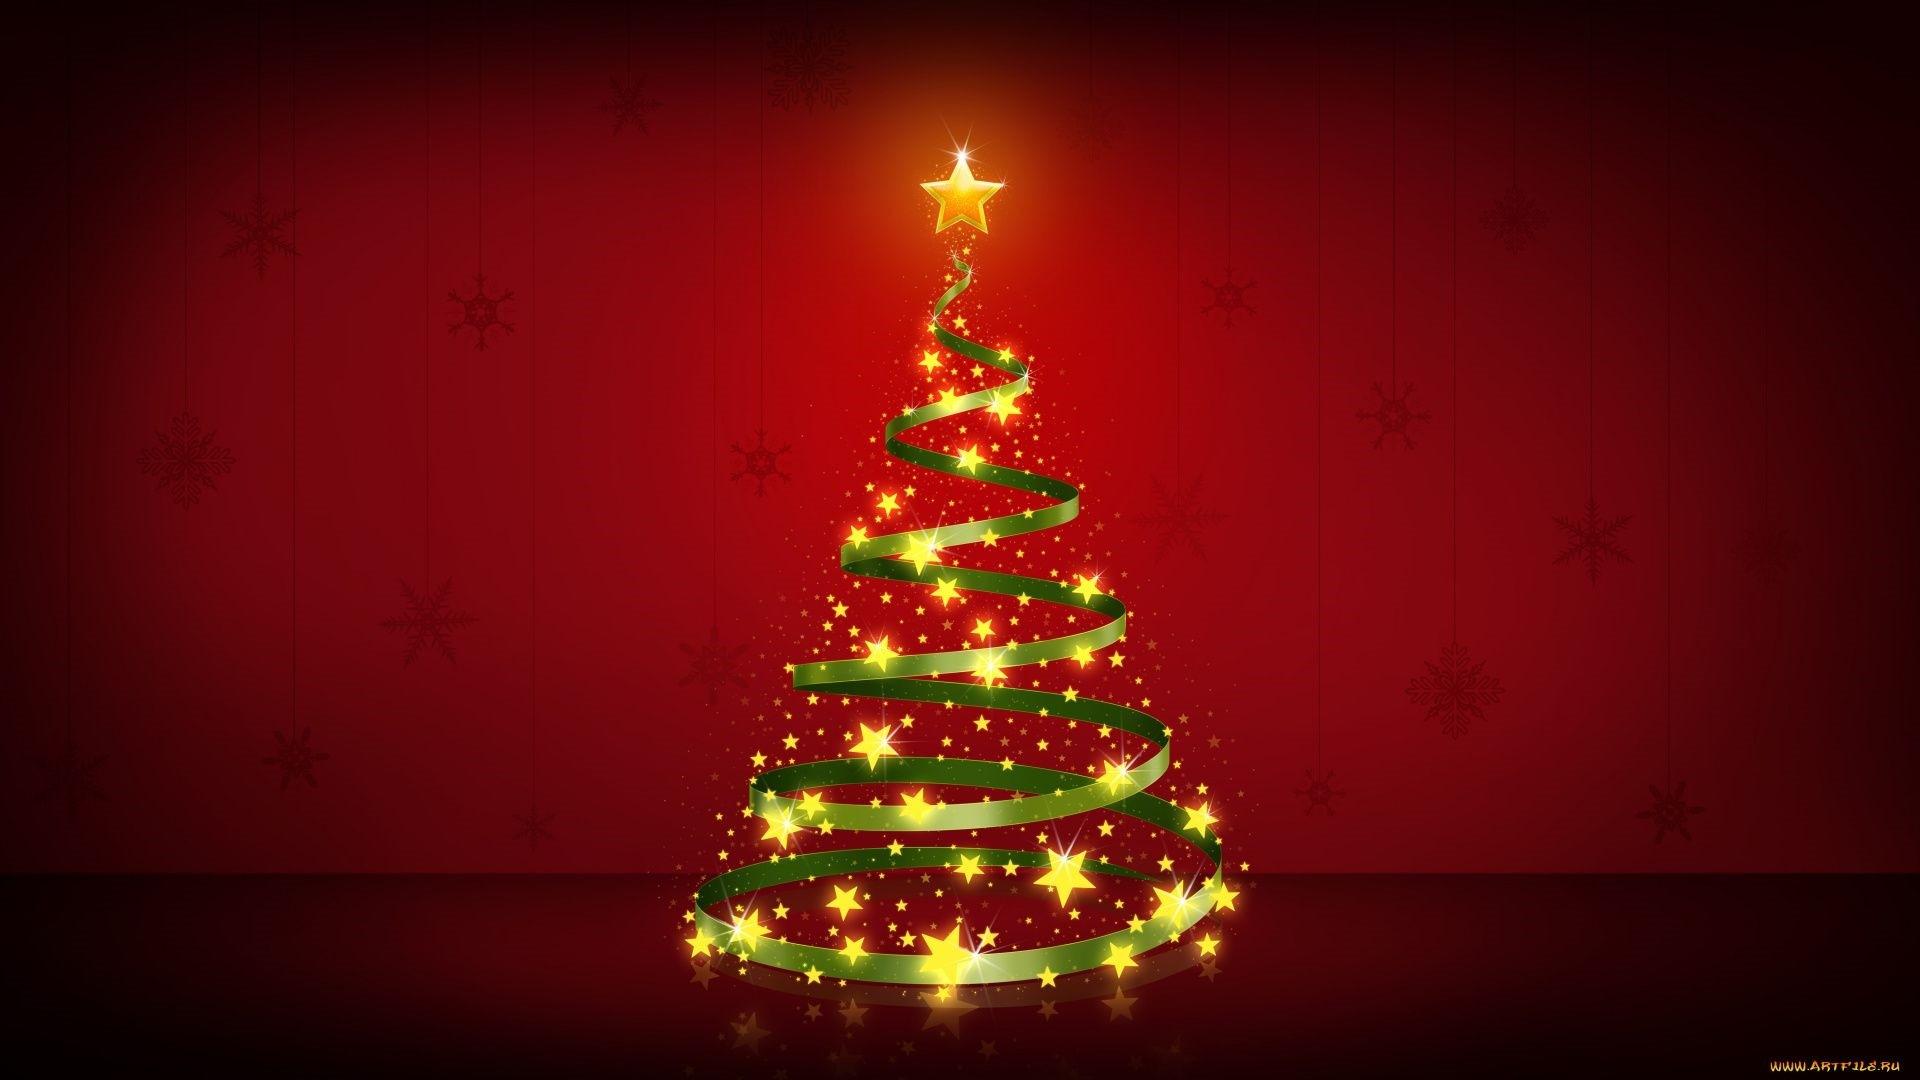 Christmas Tree a wallpaper